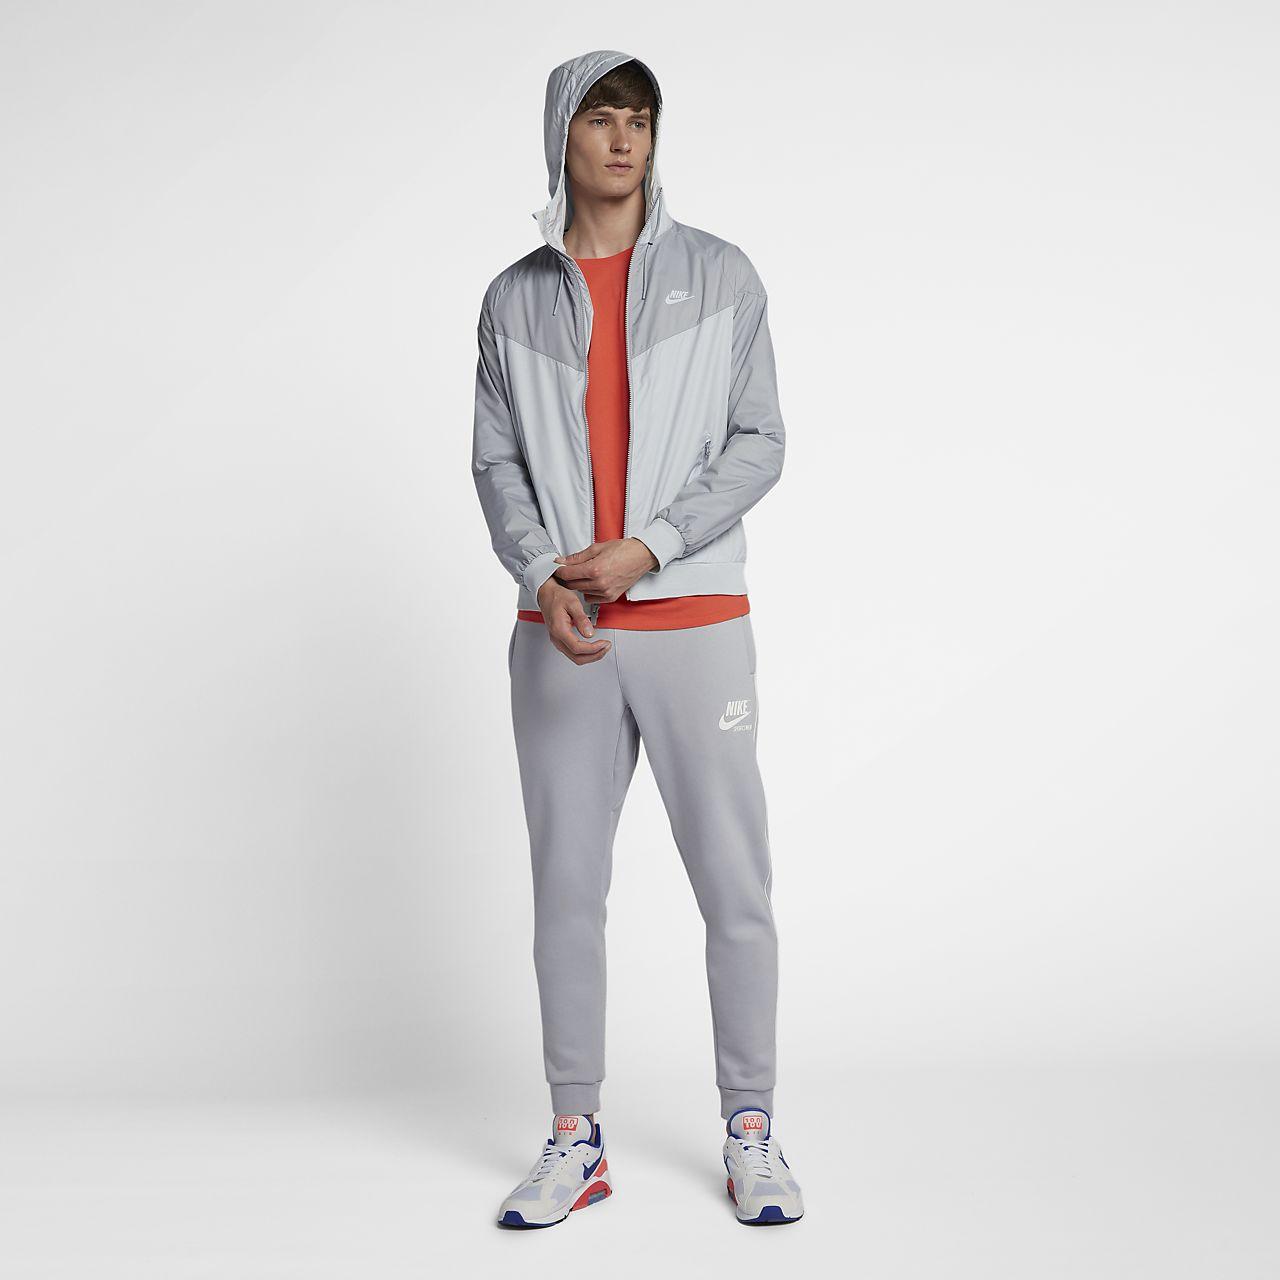 ef4adb398e4a8 Low Resolution Nike Sportswear Windrunner Men's Jacket Nike Sportswear  Windrunner Men's Jacket